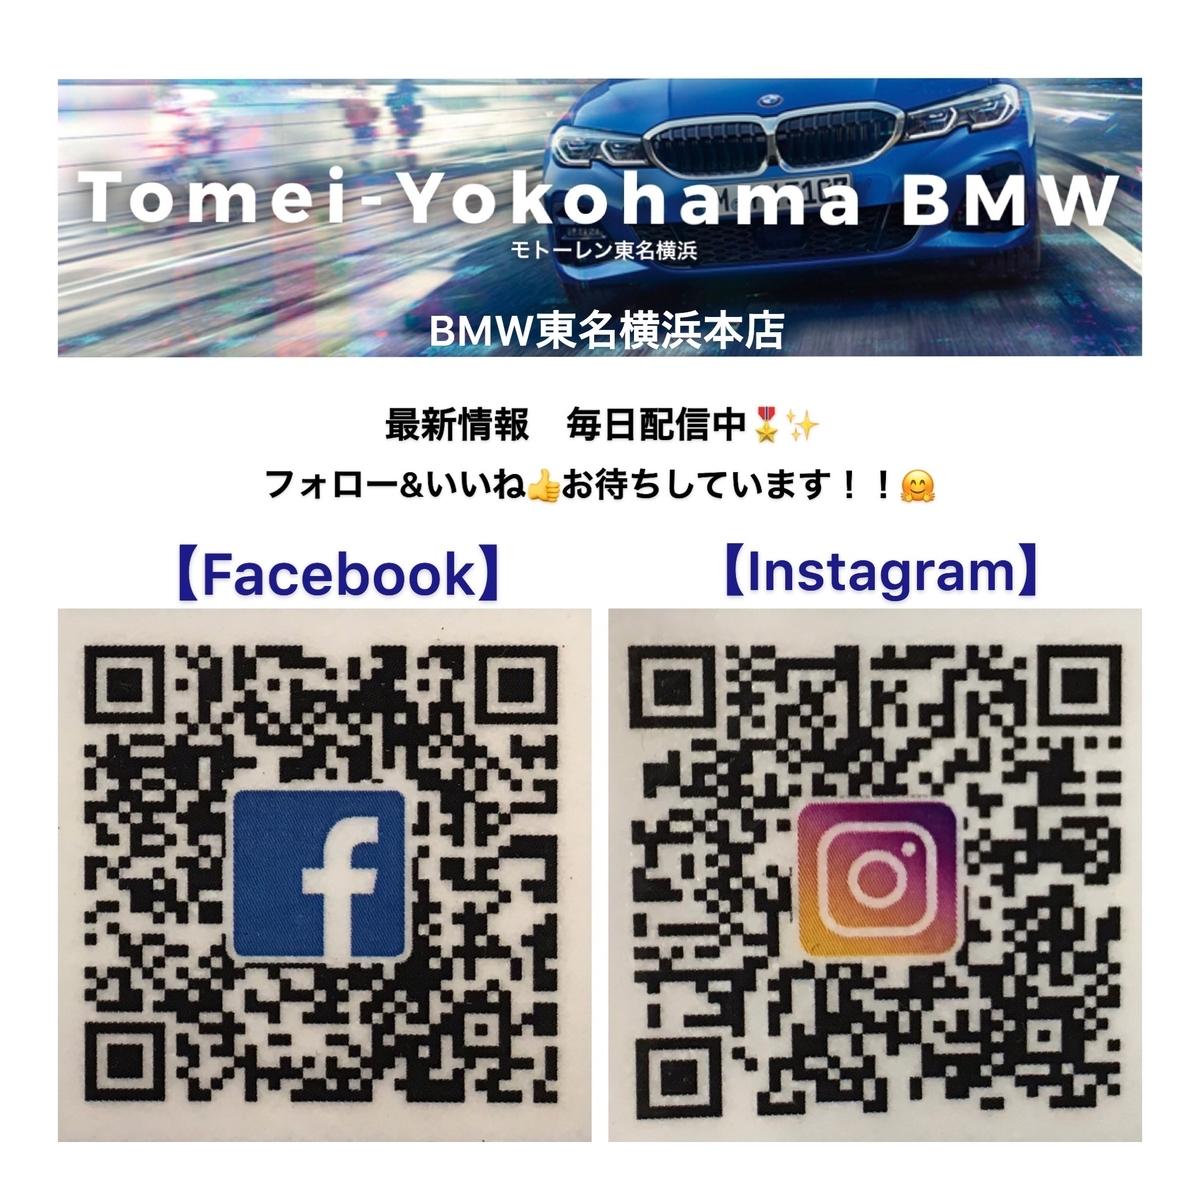 f:id:tomeiyokohama-bmw-mini:20200629142721j:plain